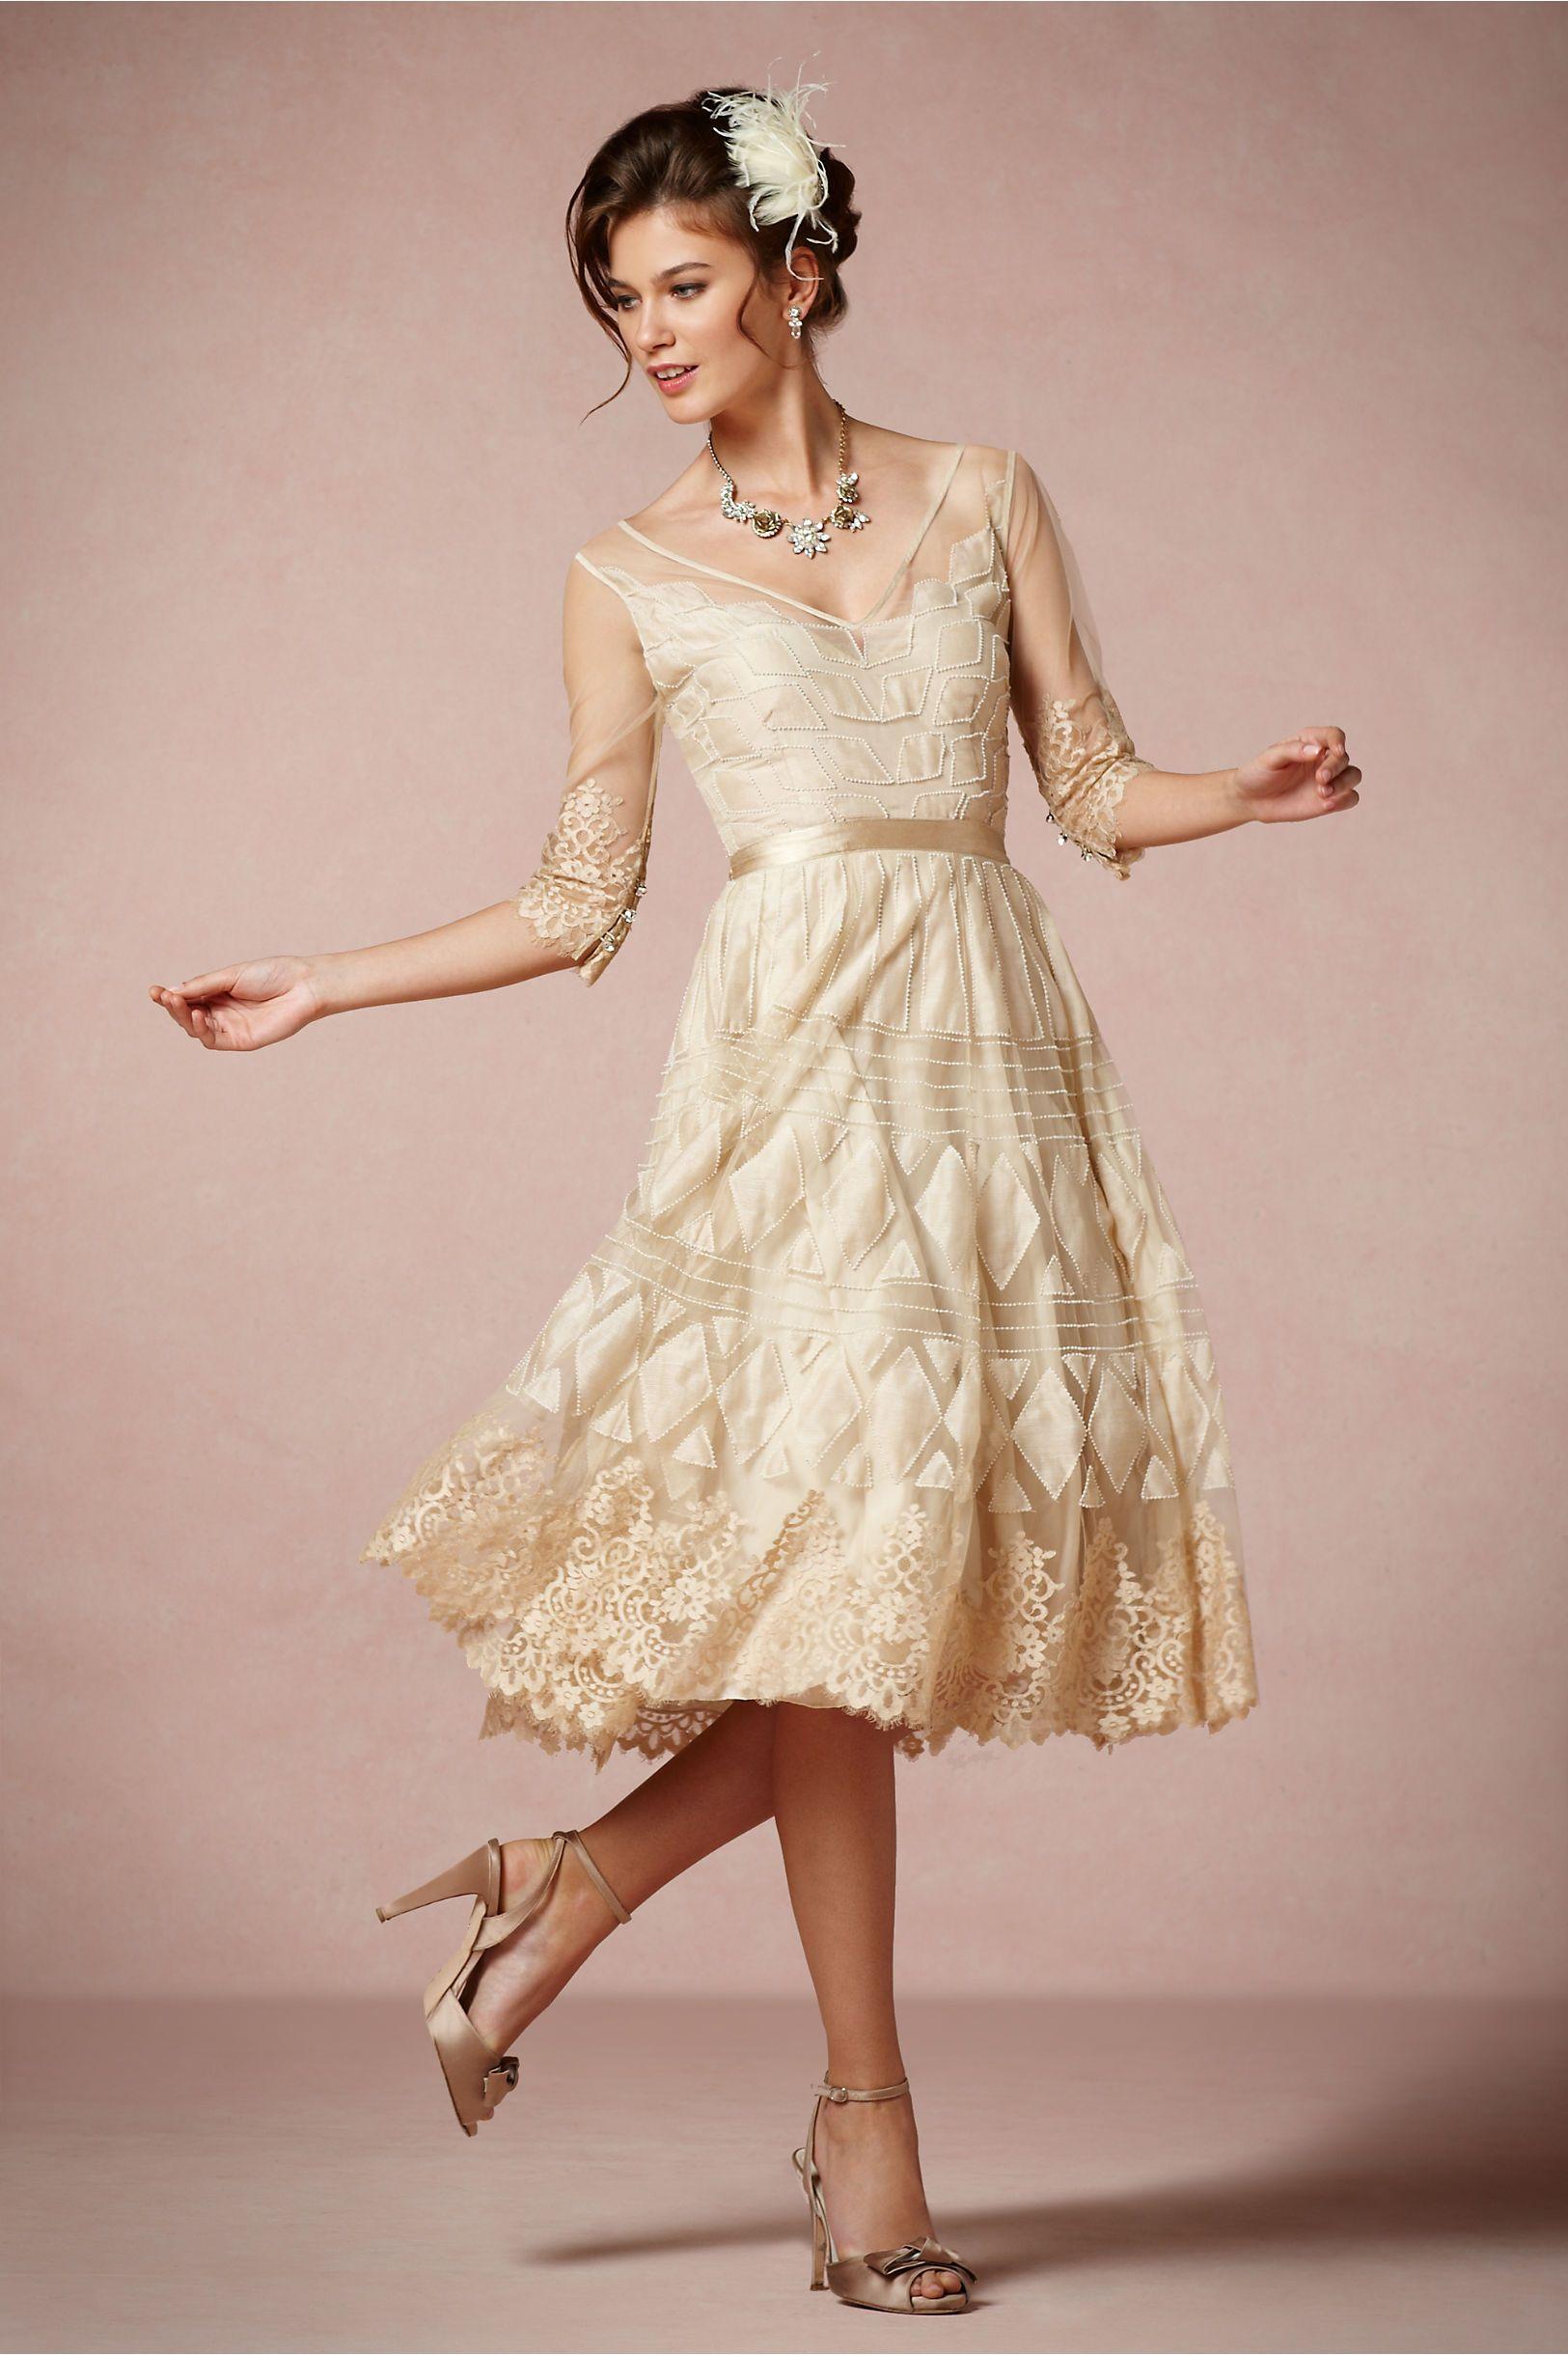 Charm school dress in bride wedding dresses at bhldn style